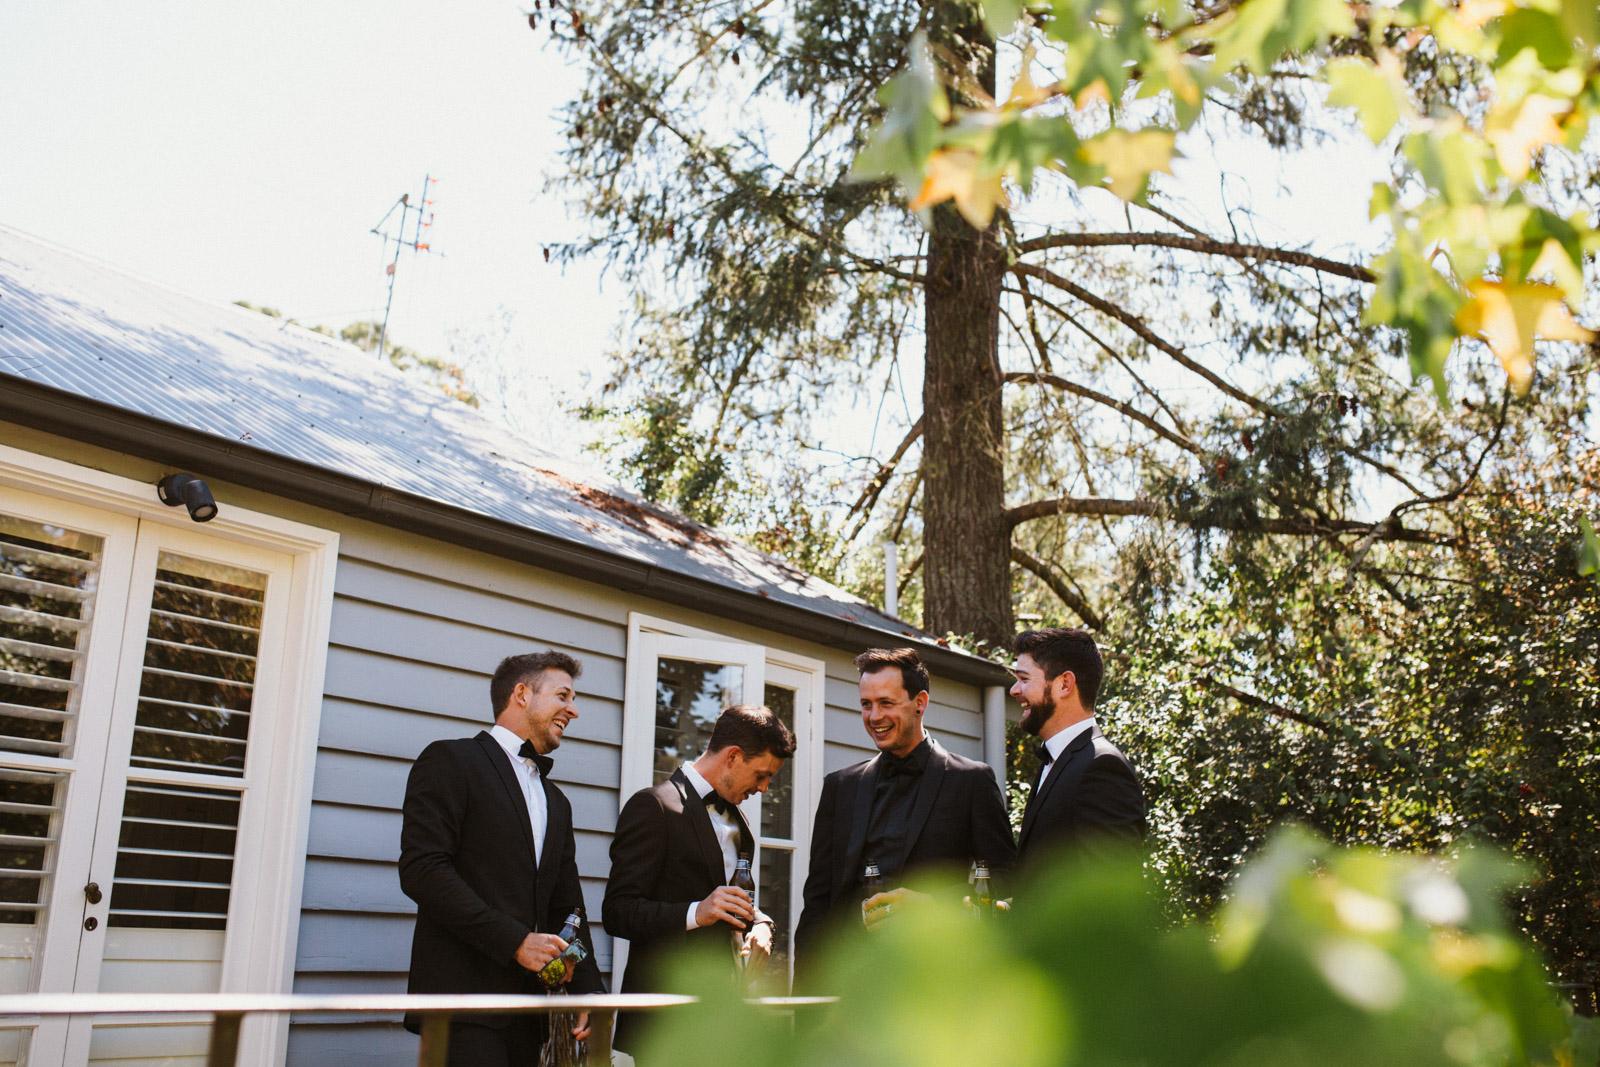 ZD-Melbourne Wedding Photographer-Dean Raphael-12.jpg